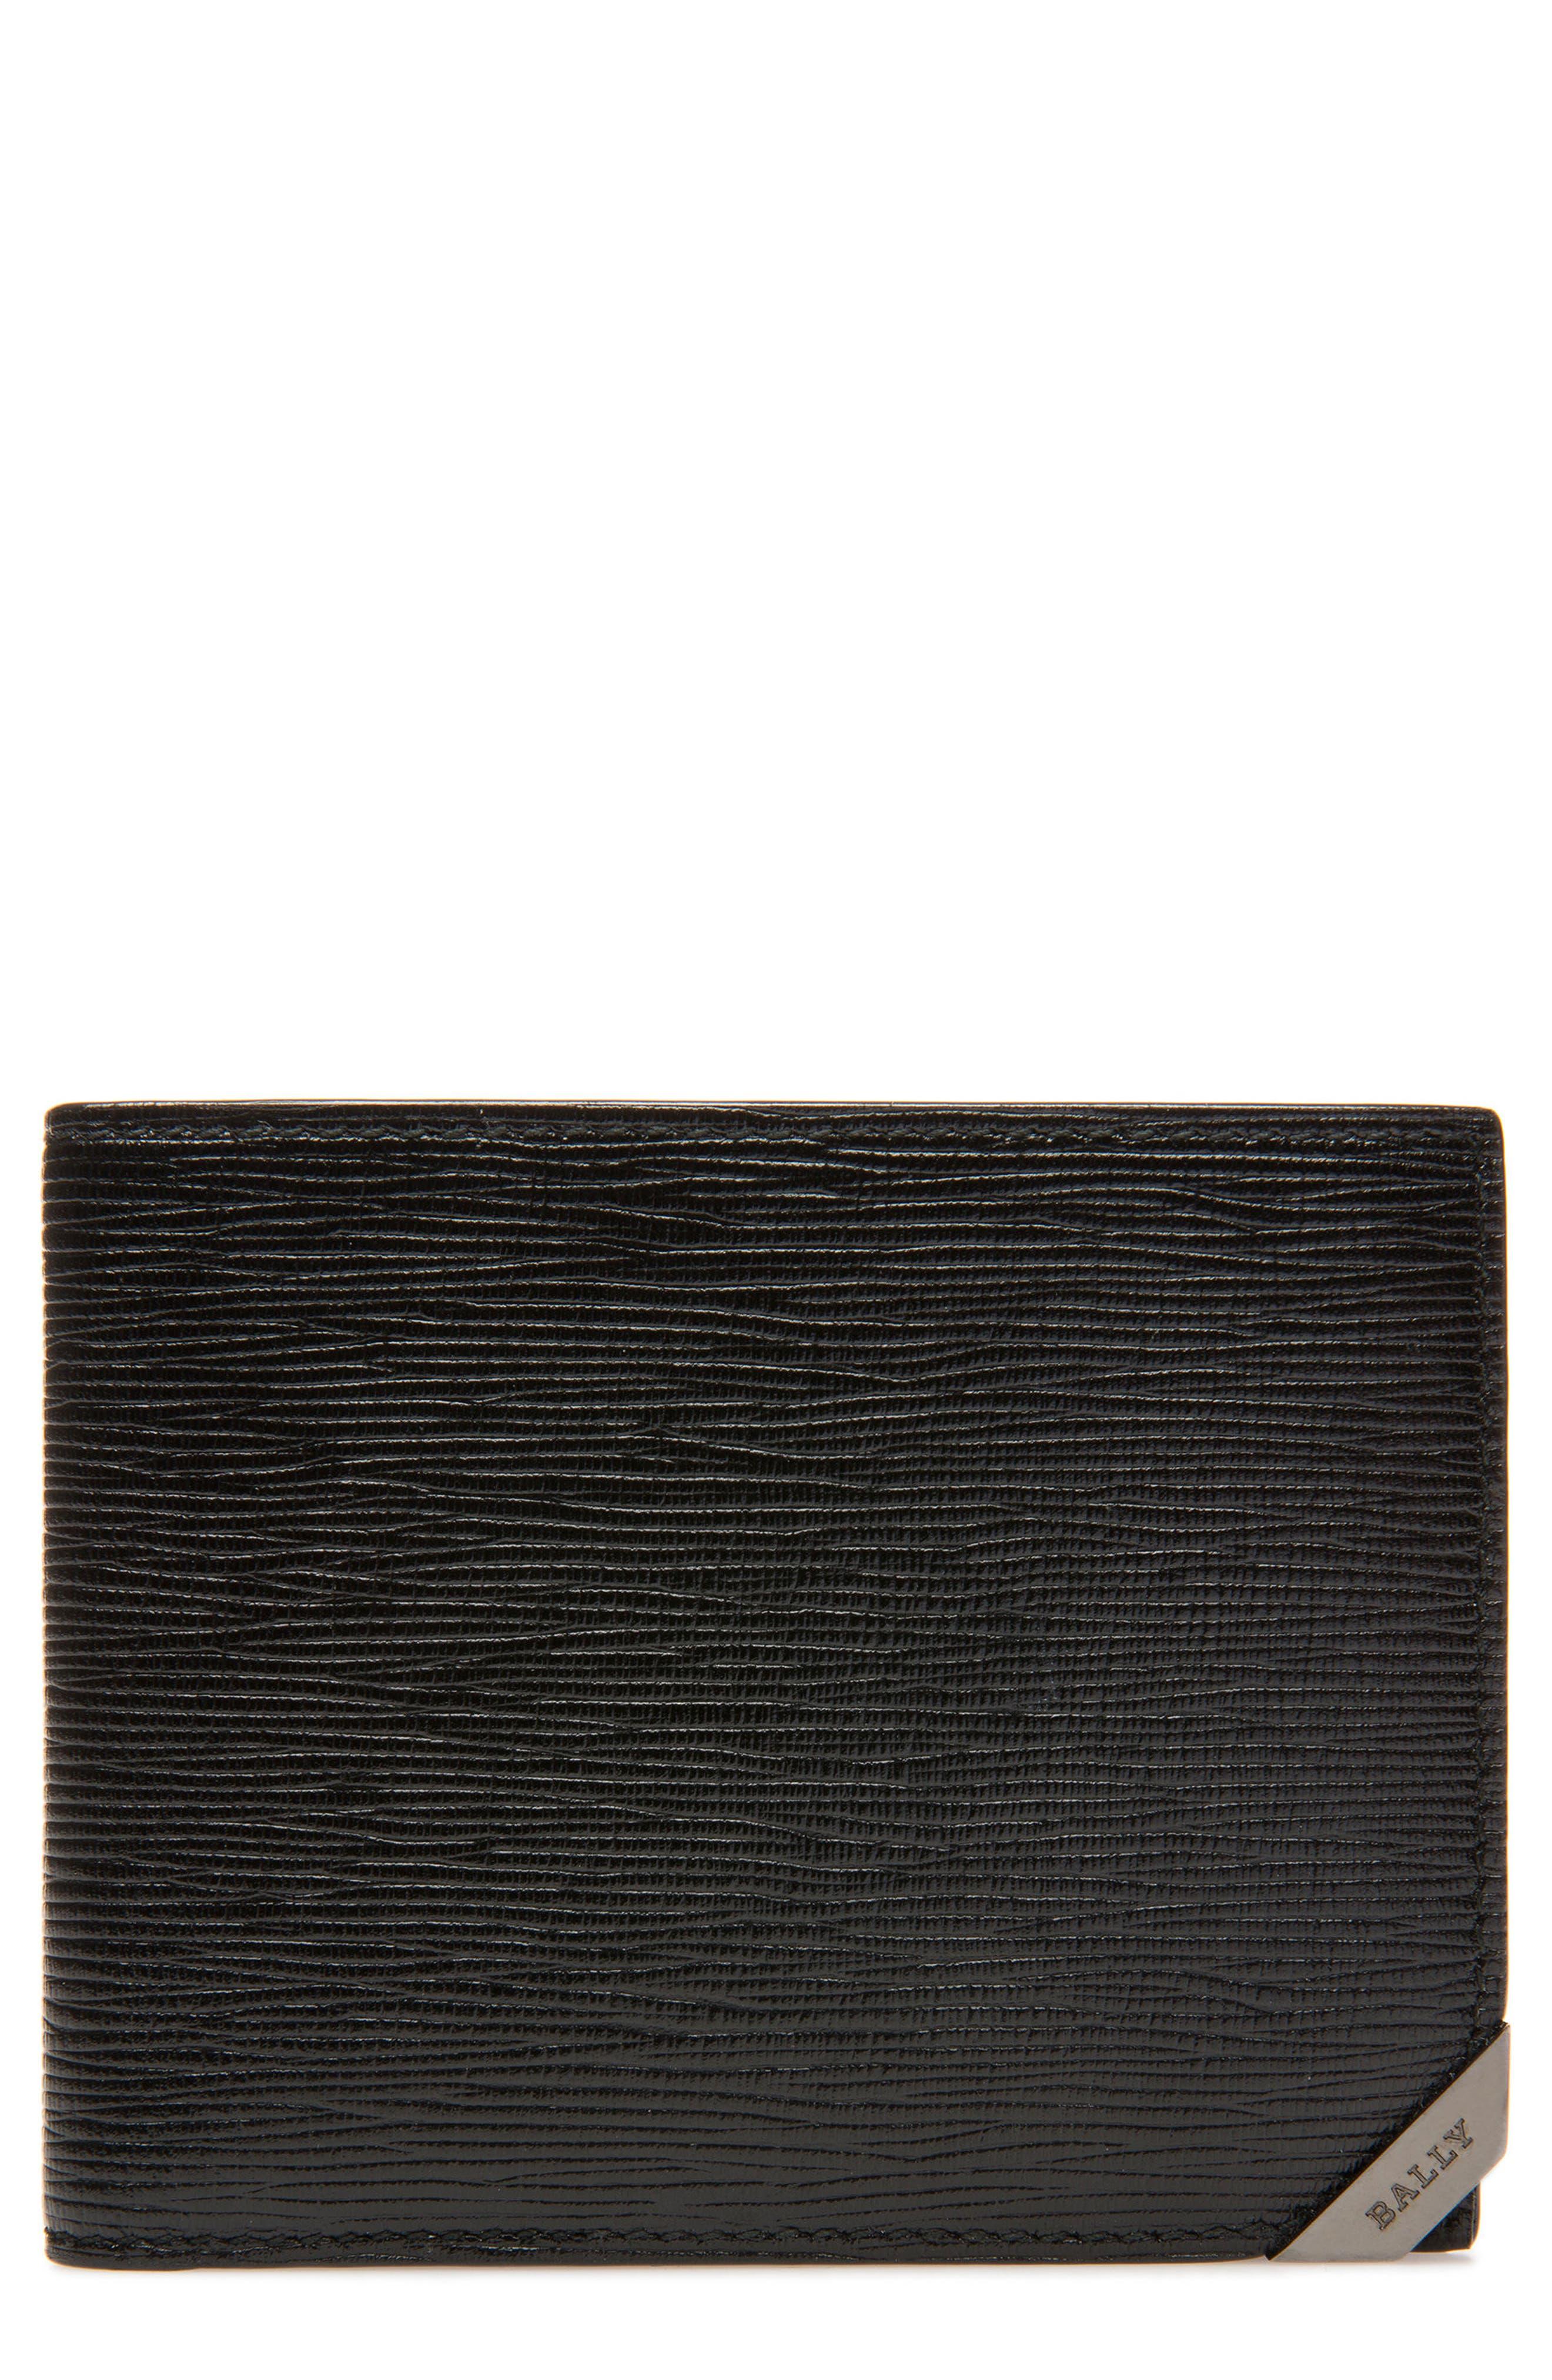 Bevye Leather Wallet,                             Main thumbnail 1, color,                             Black